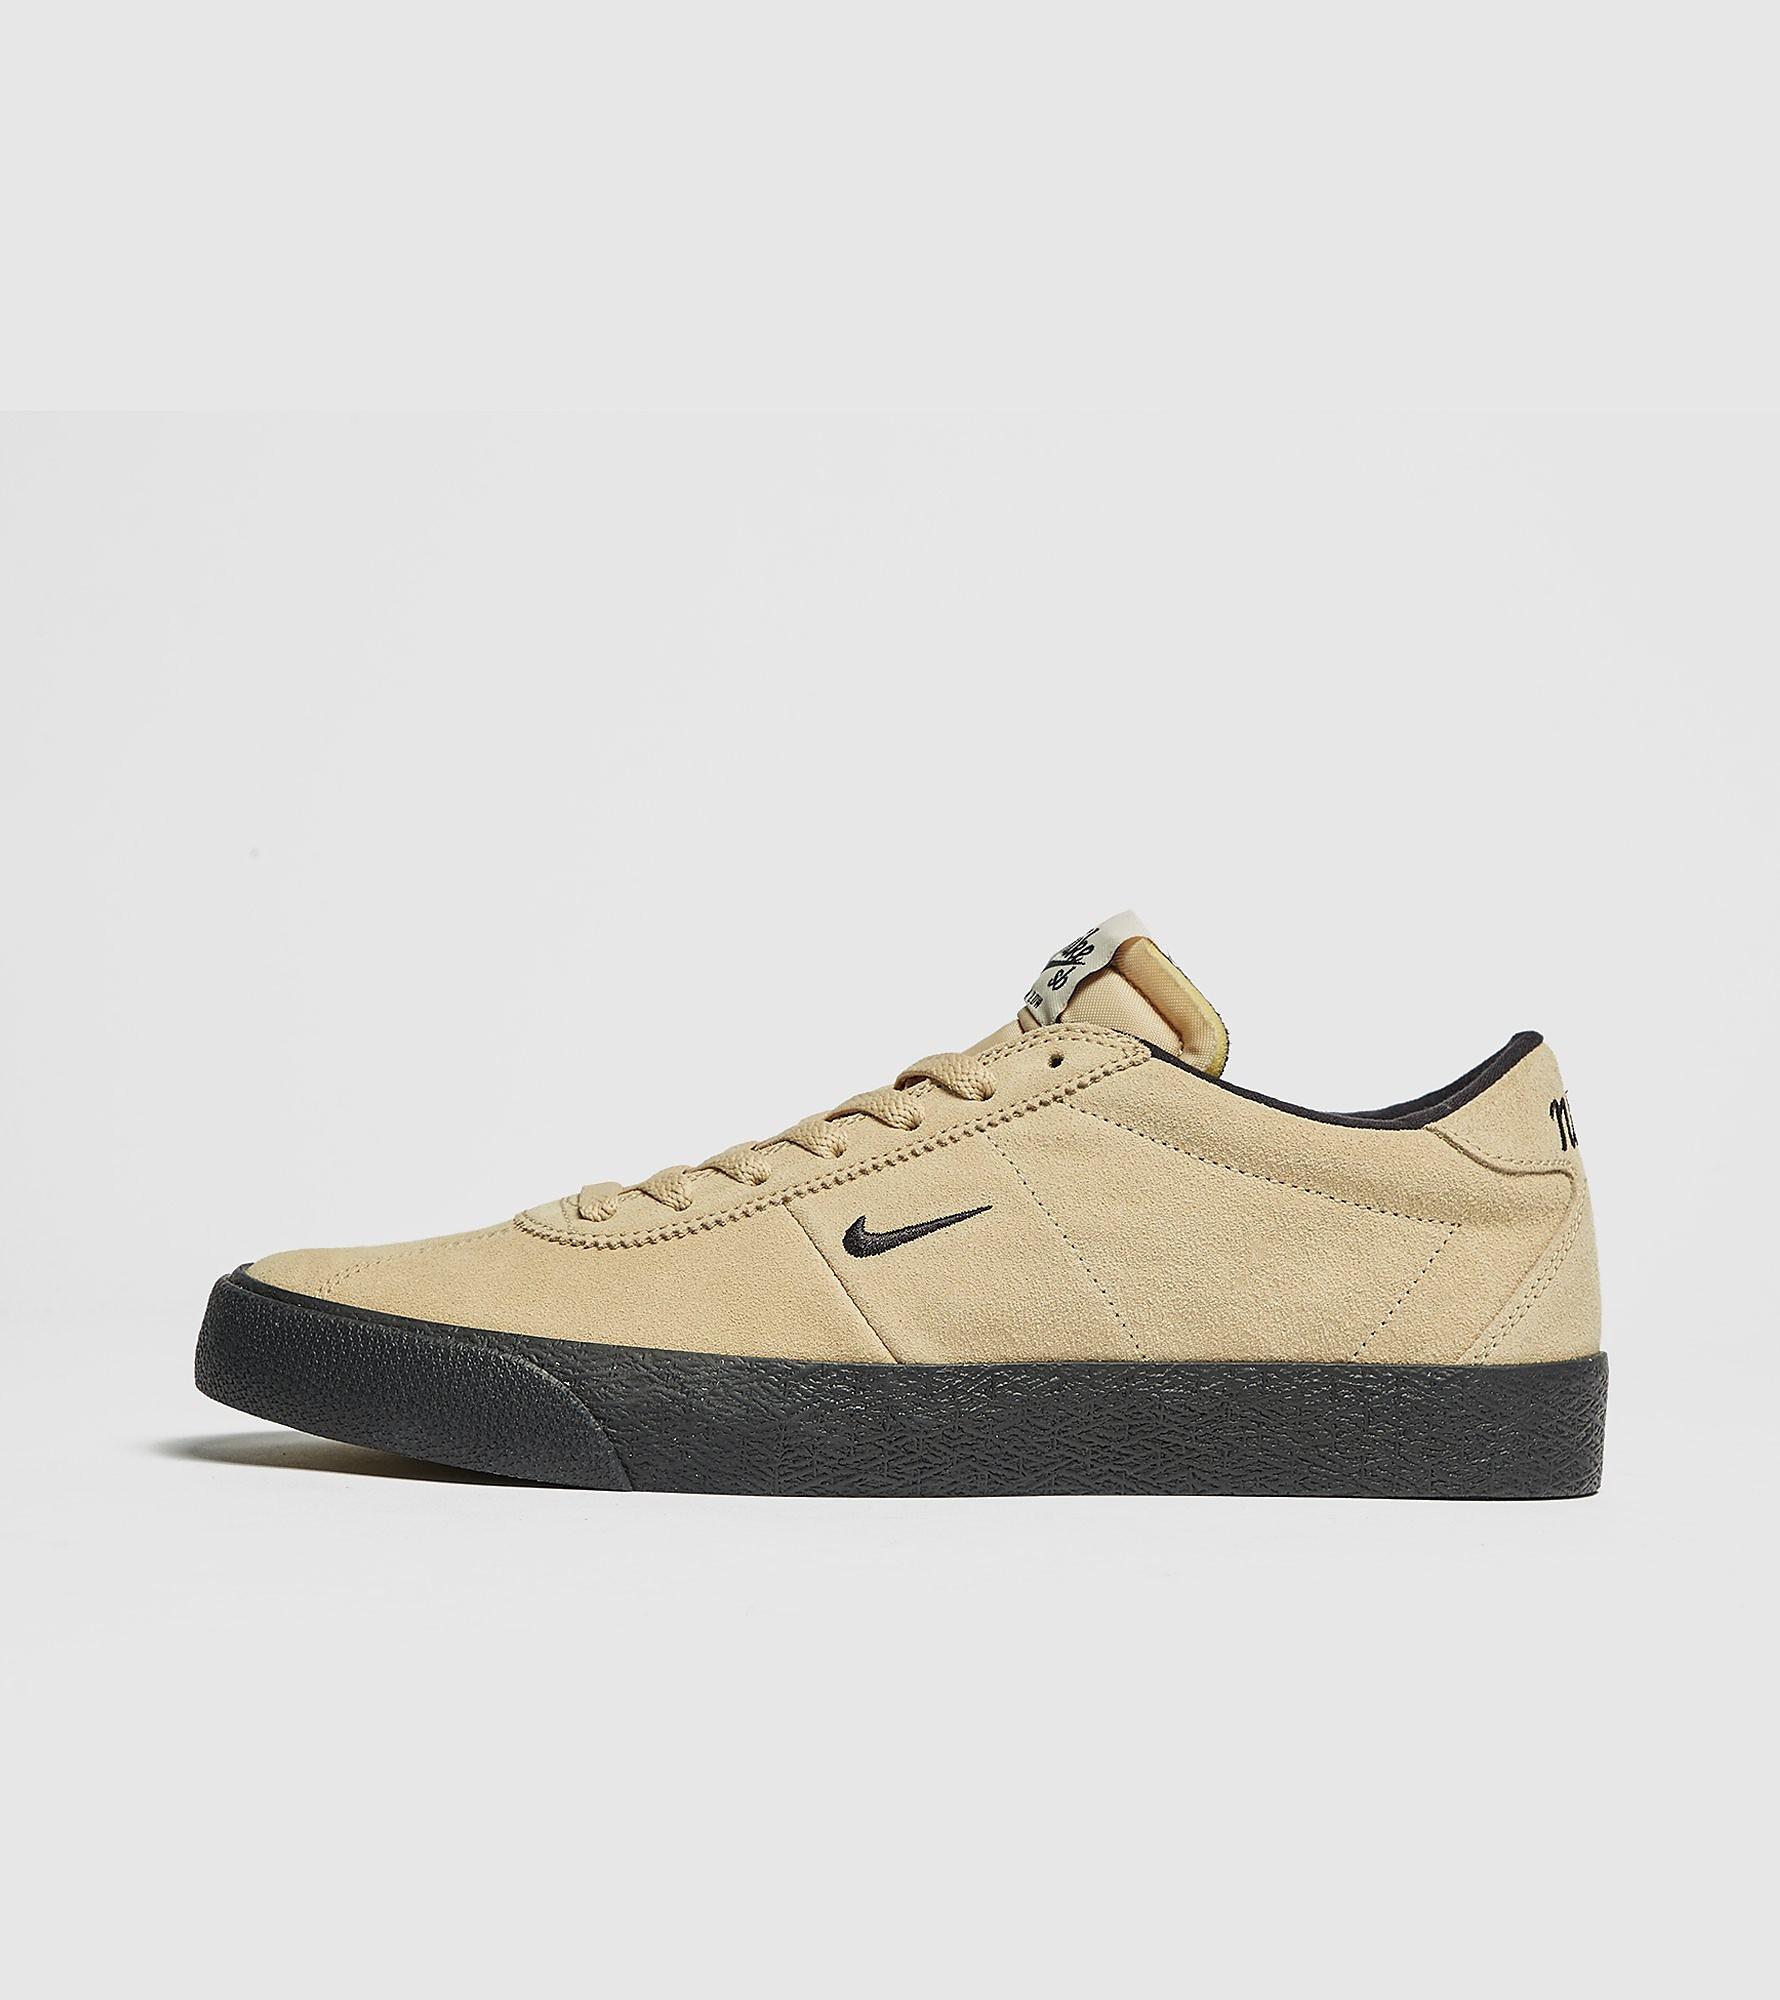 Nike SB x NBA Zoom Bruin Shoes (black black)